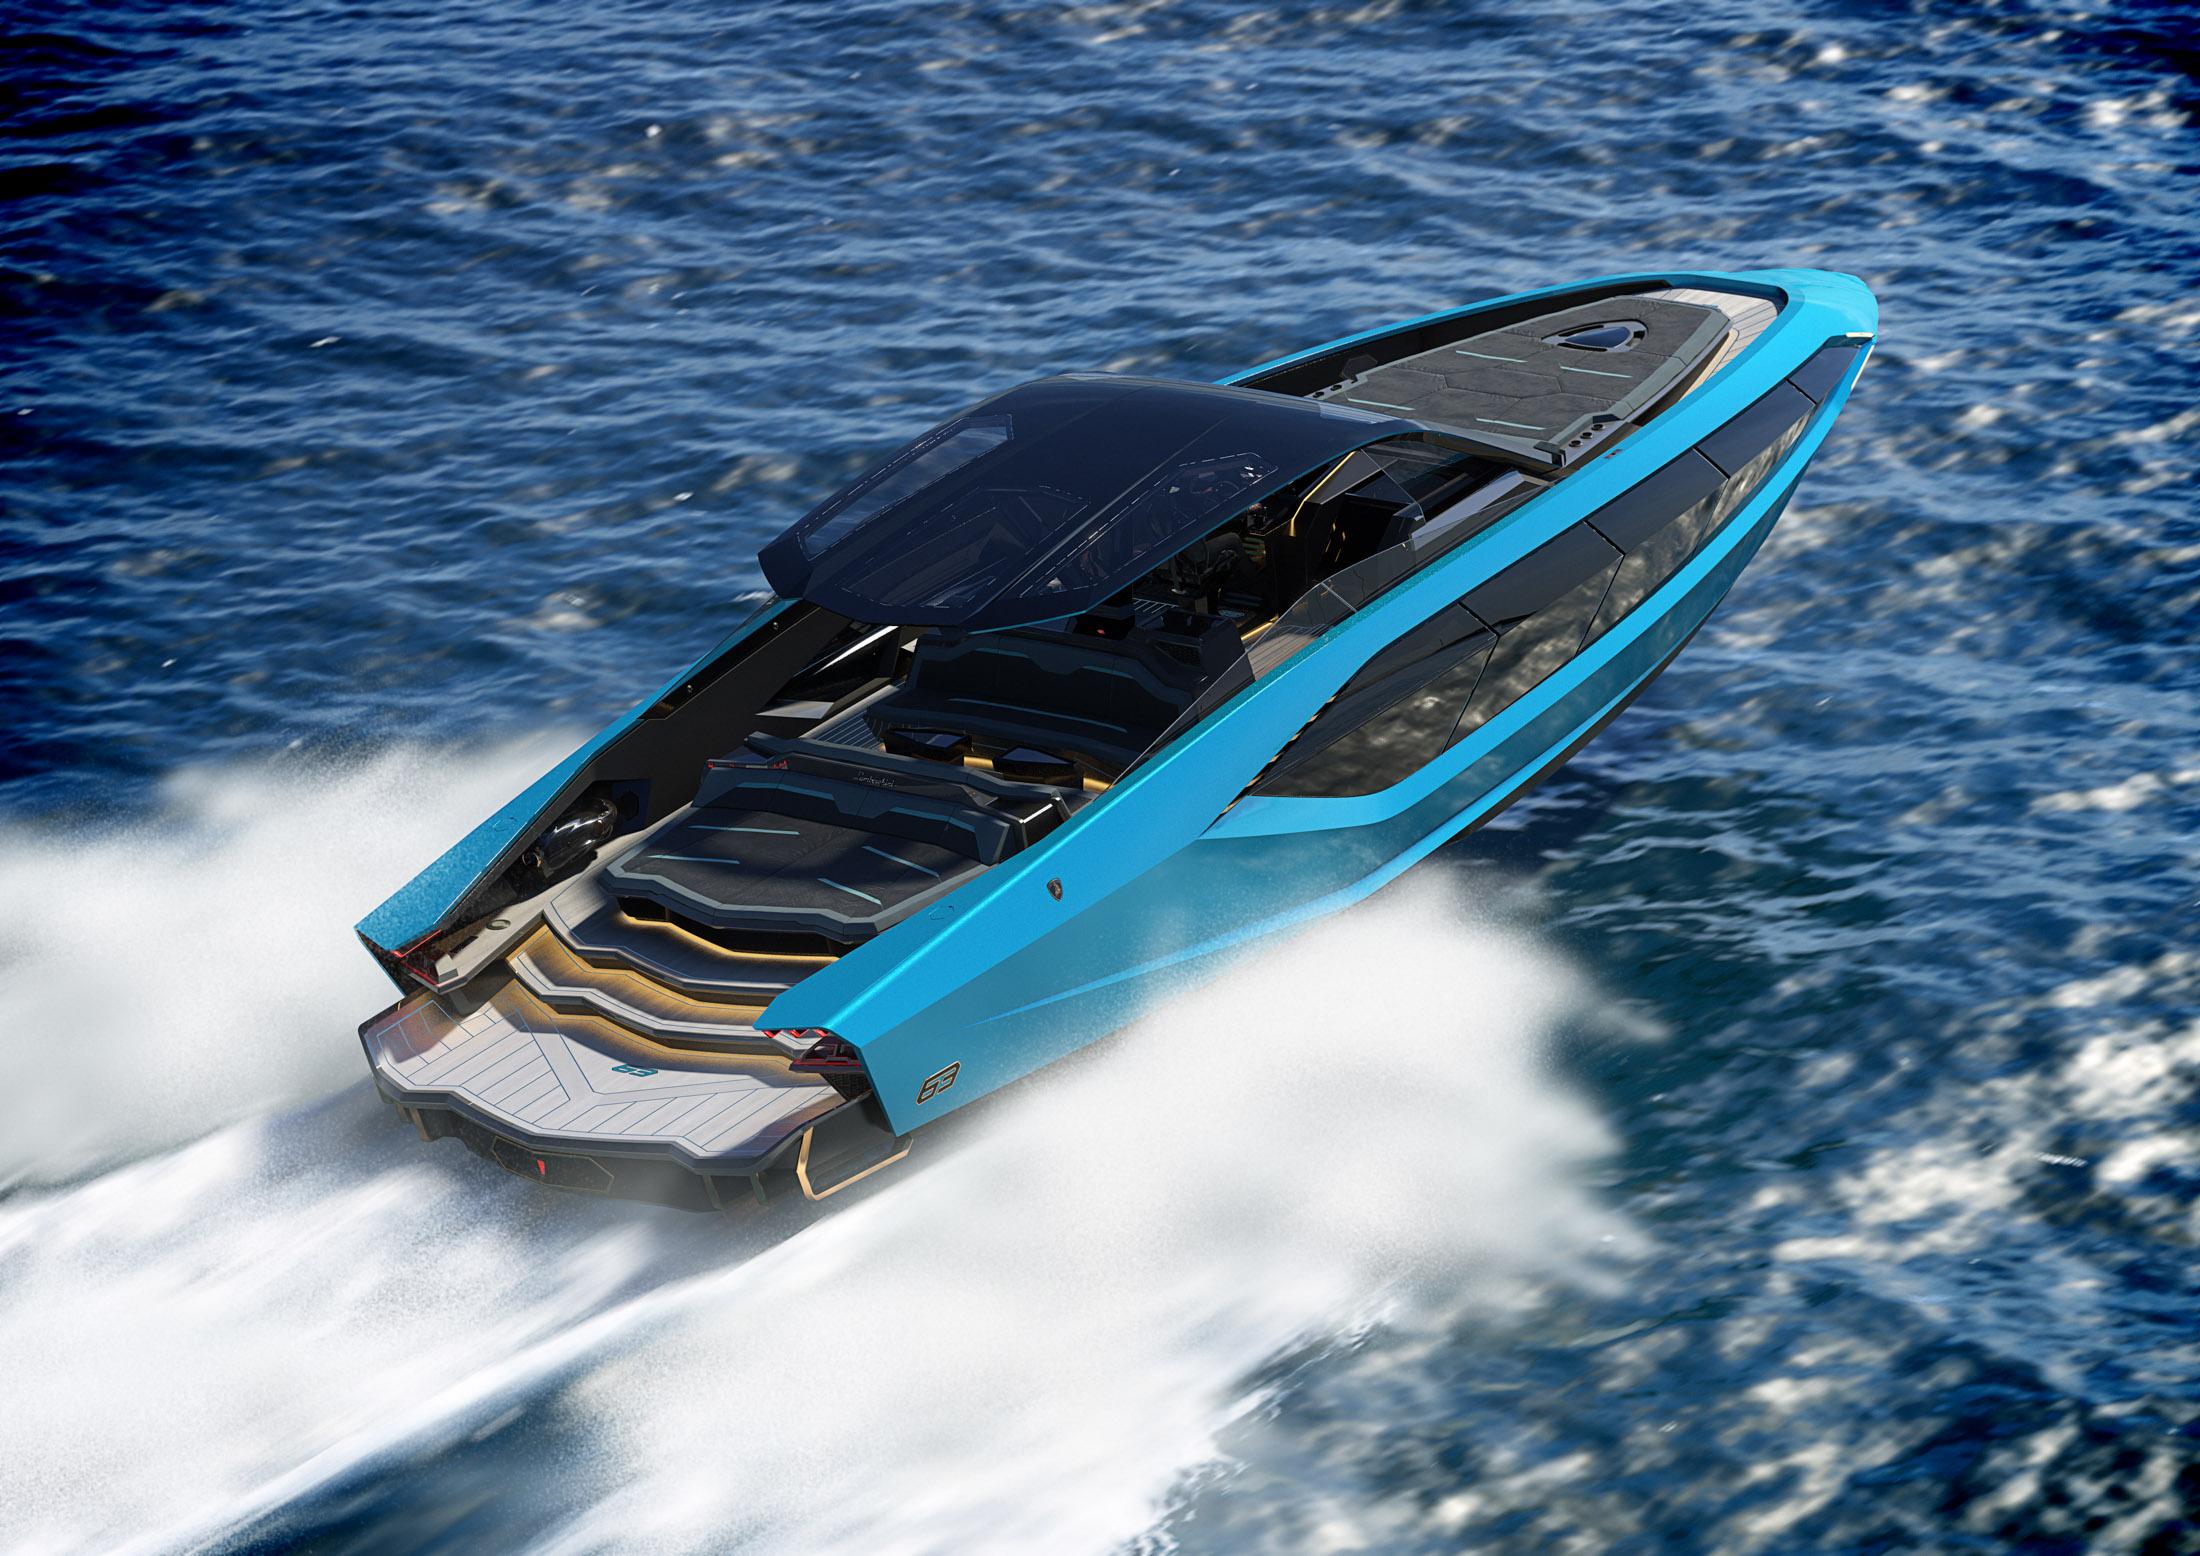 Lamborghini's New $3.4 Million Yacht Has Splashy Supercar DNA - Bloomberg